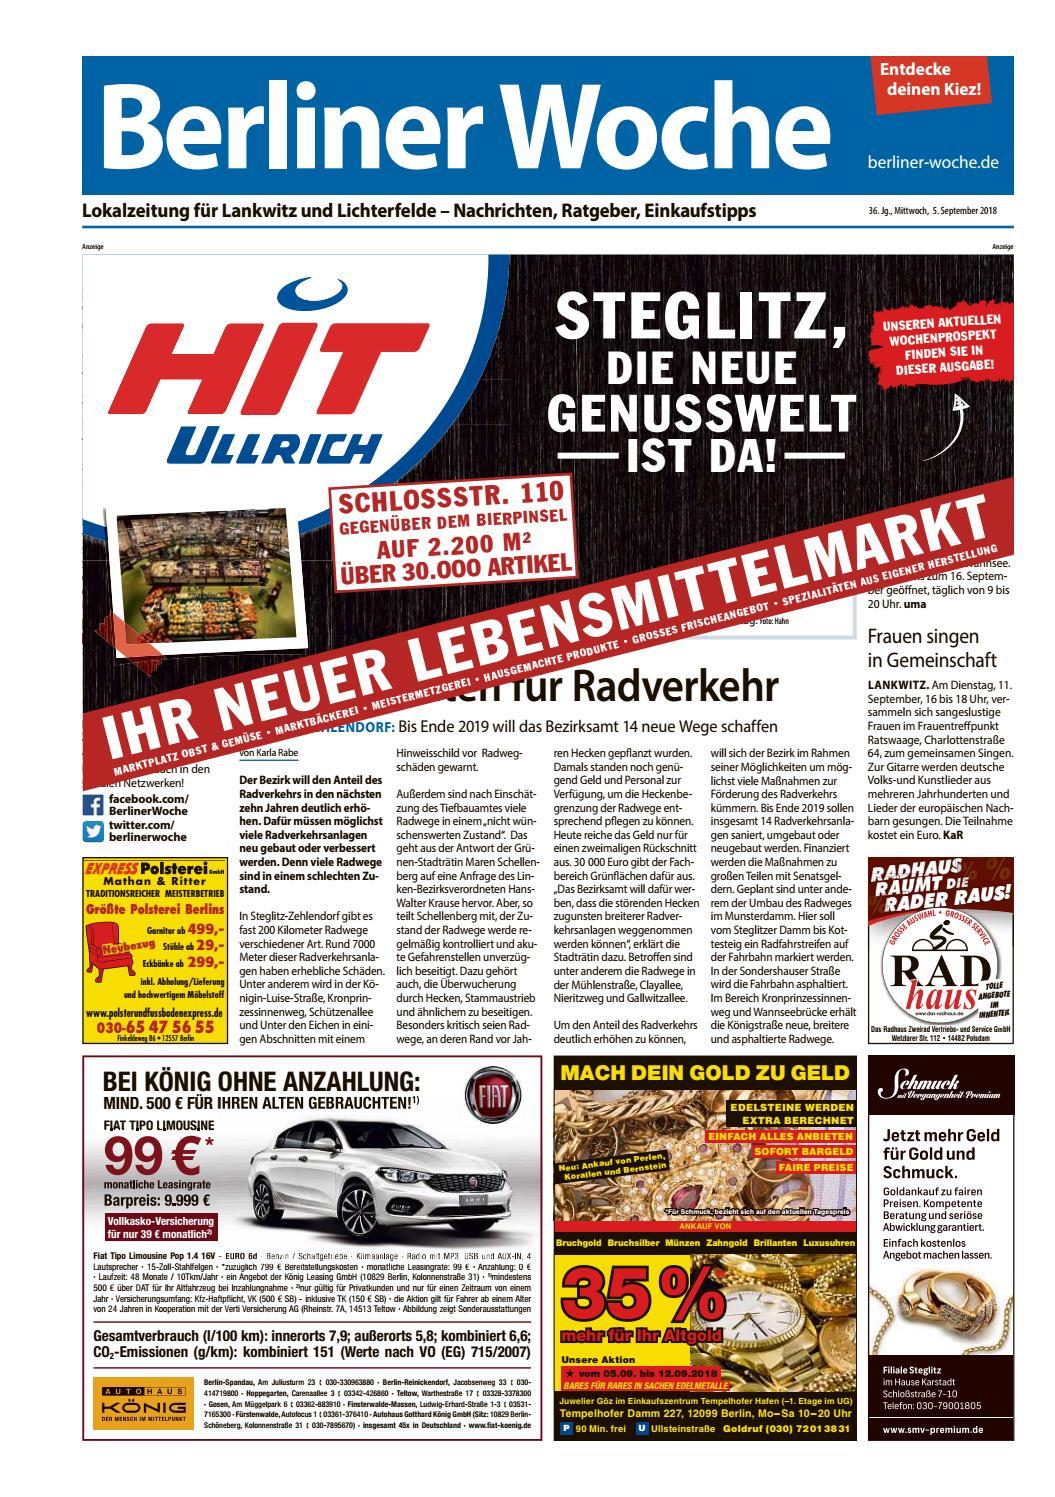 Mann 54 hoppegarten sucht hobbys motorrad [PUNIQRANDLINE-(au-dating-names.txt) 39